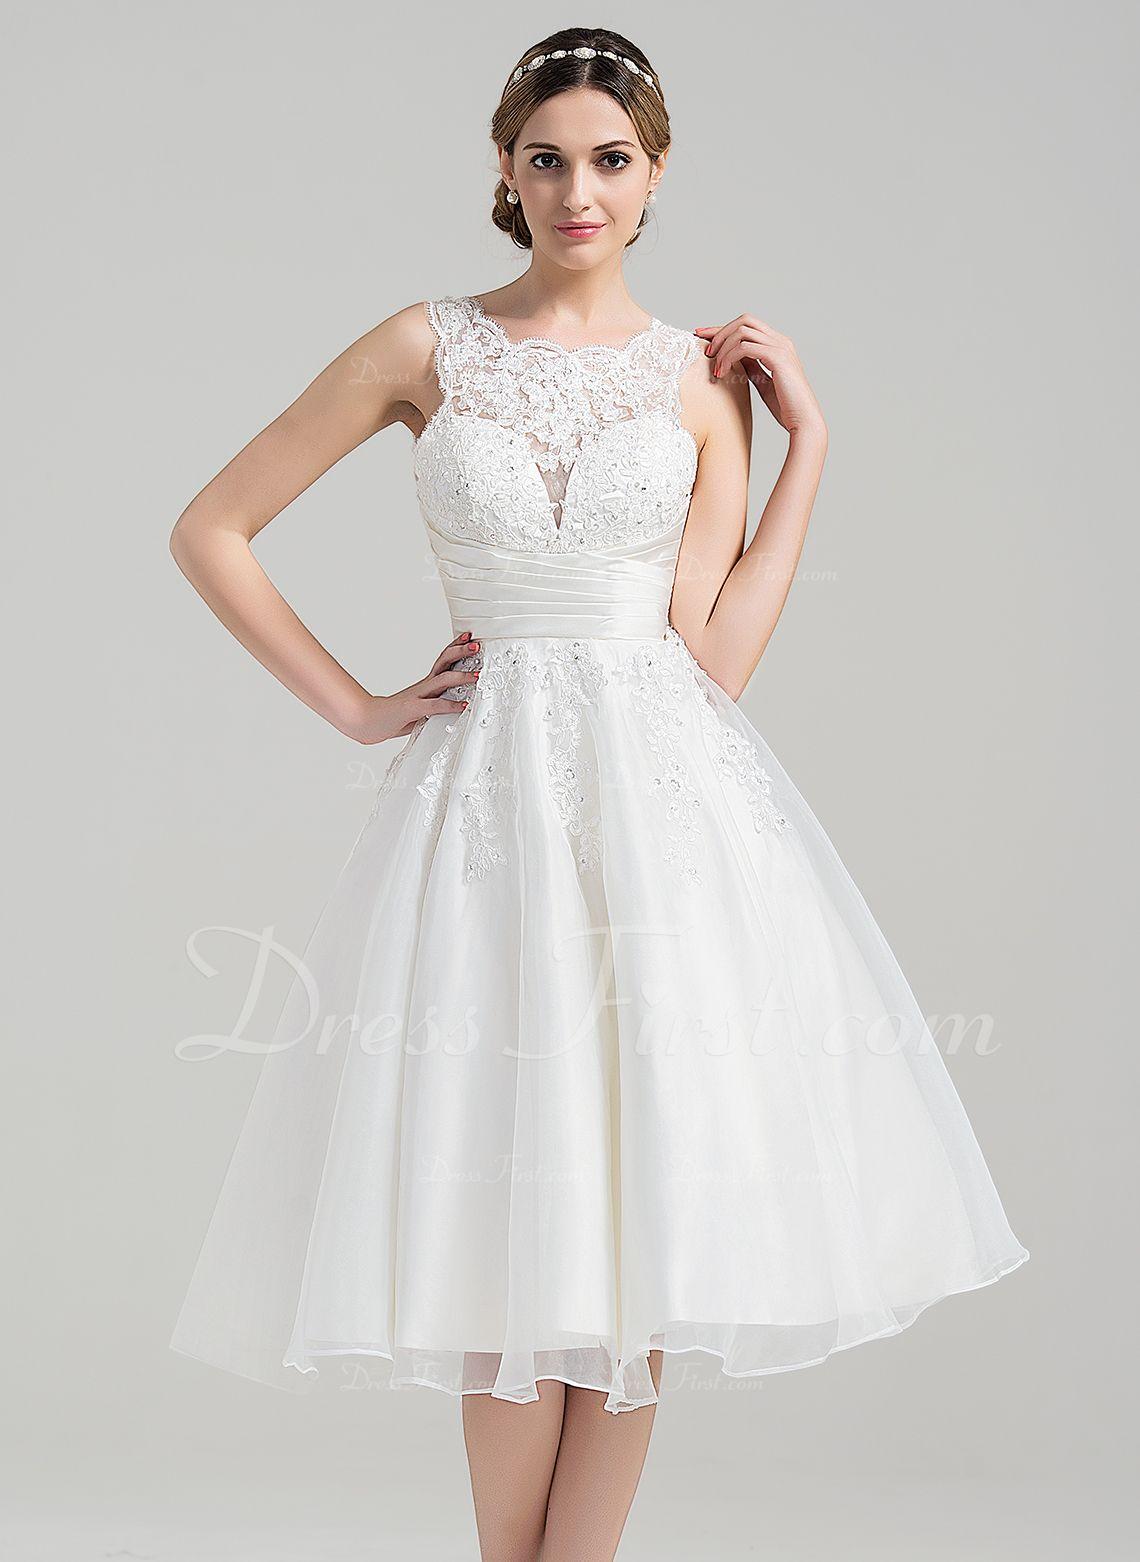 44+ Princess scoop neck wedding dress ideas in 2021